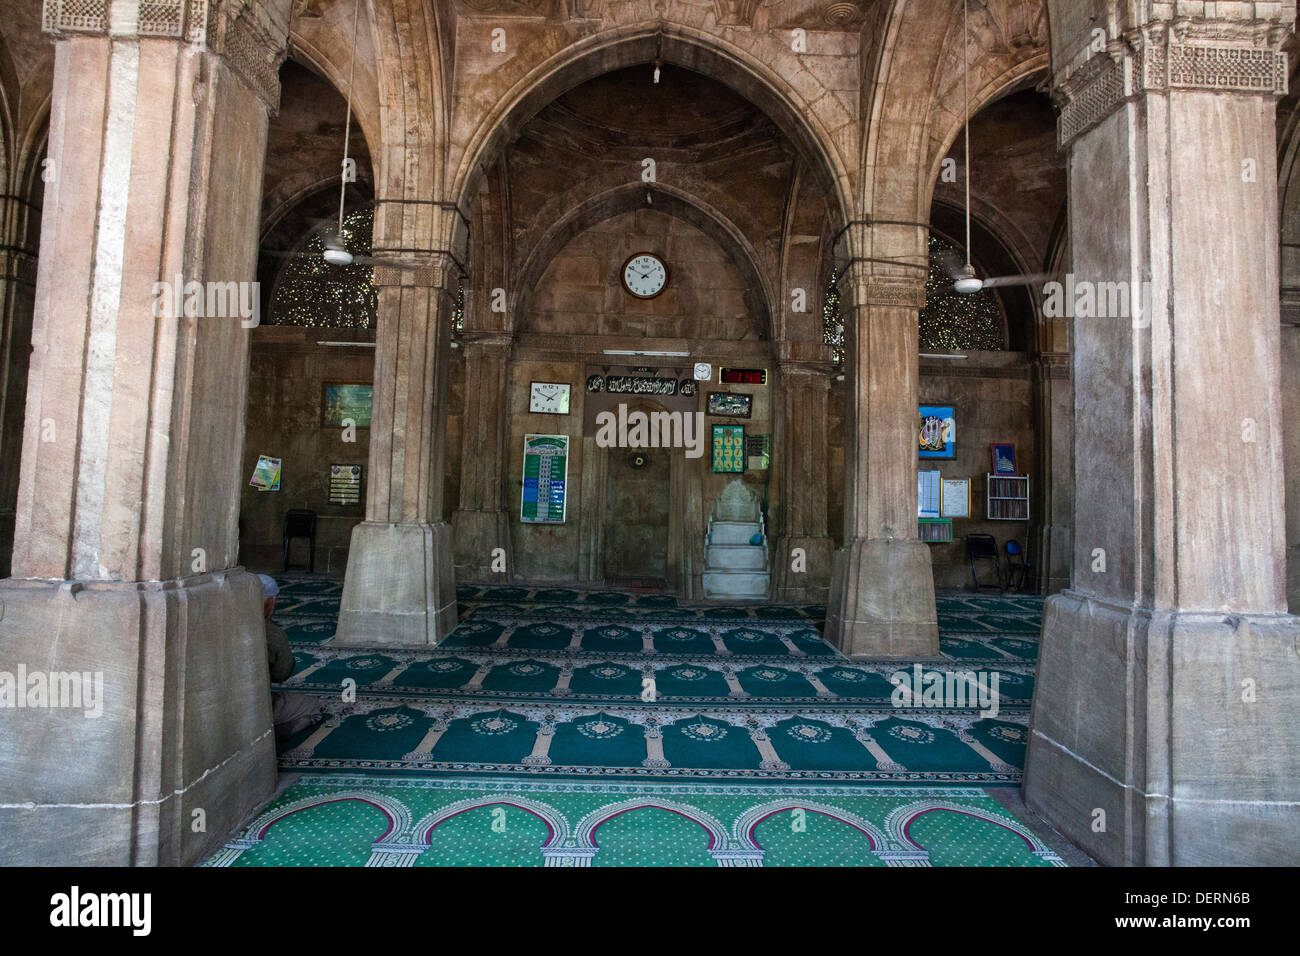 Interiors of a mosque, Sidi Saiyyed Mosque, Ahmedabad, Gujarat, India - Stock Image